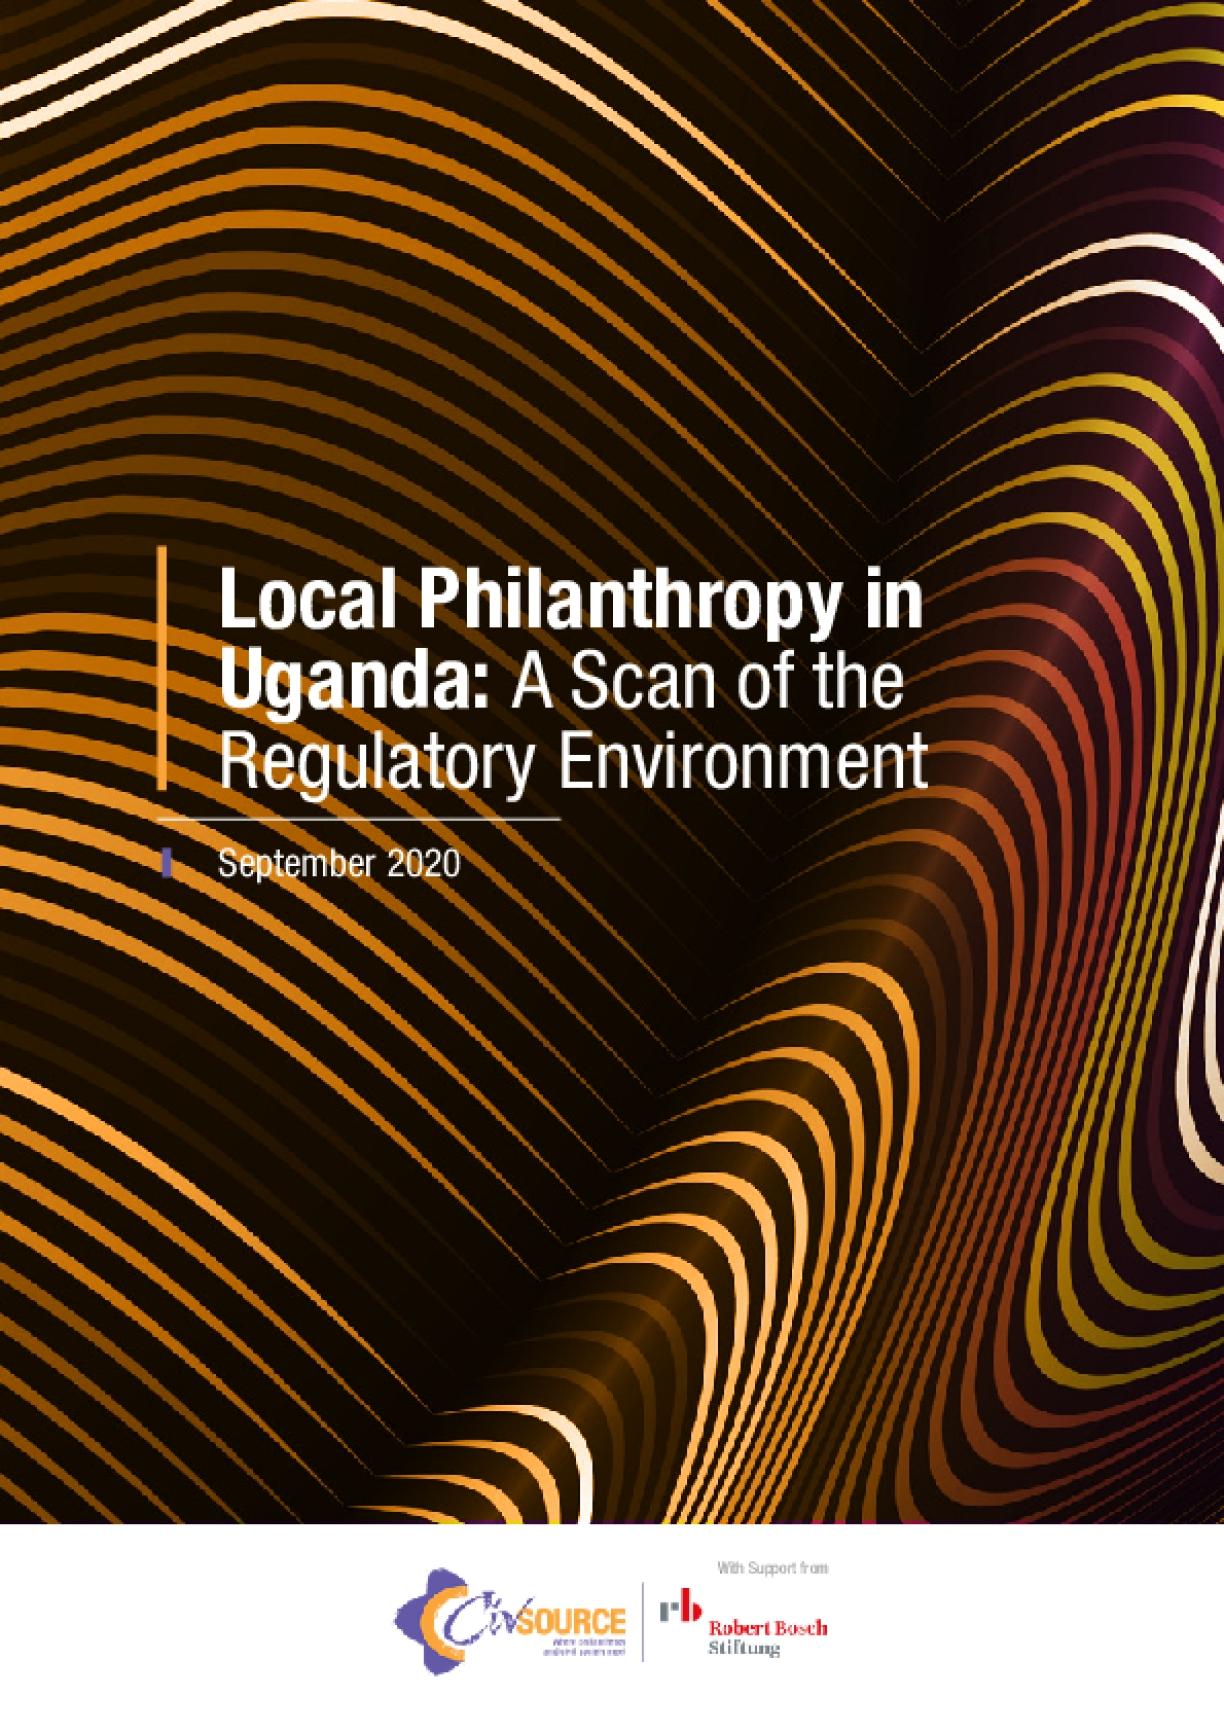 Local Philanthropy in Uganda: A Scan of the Regulatory Environment